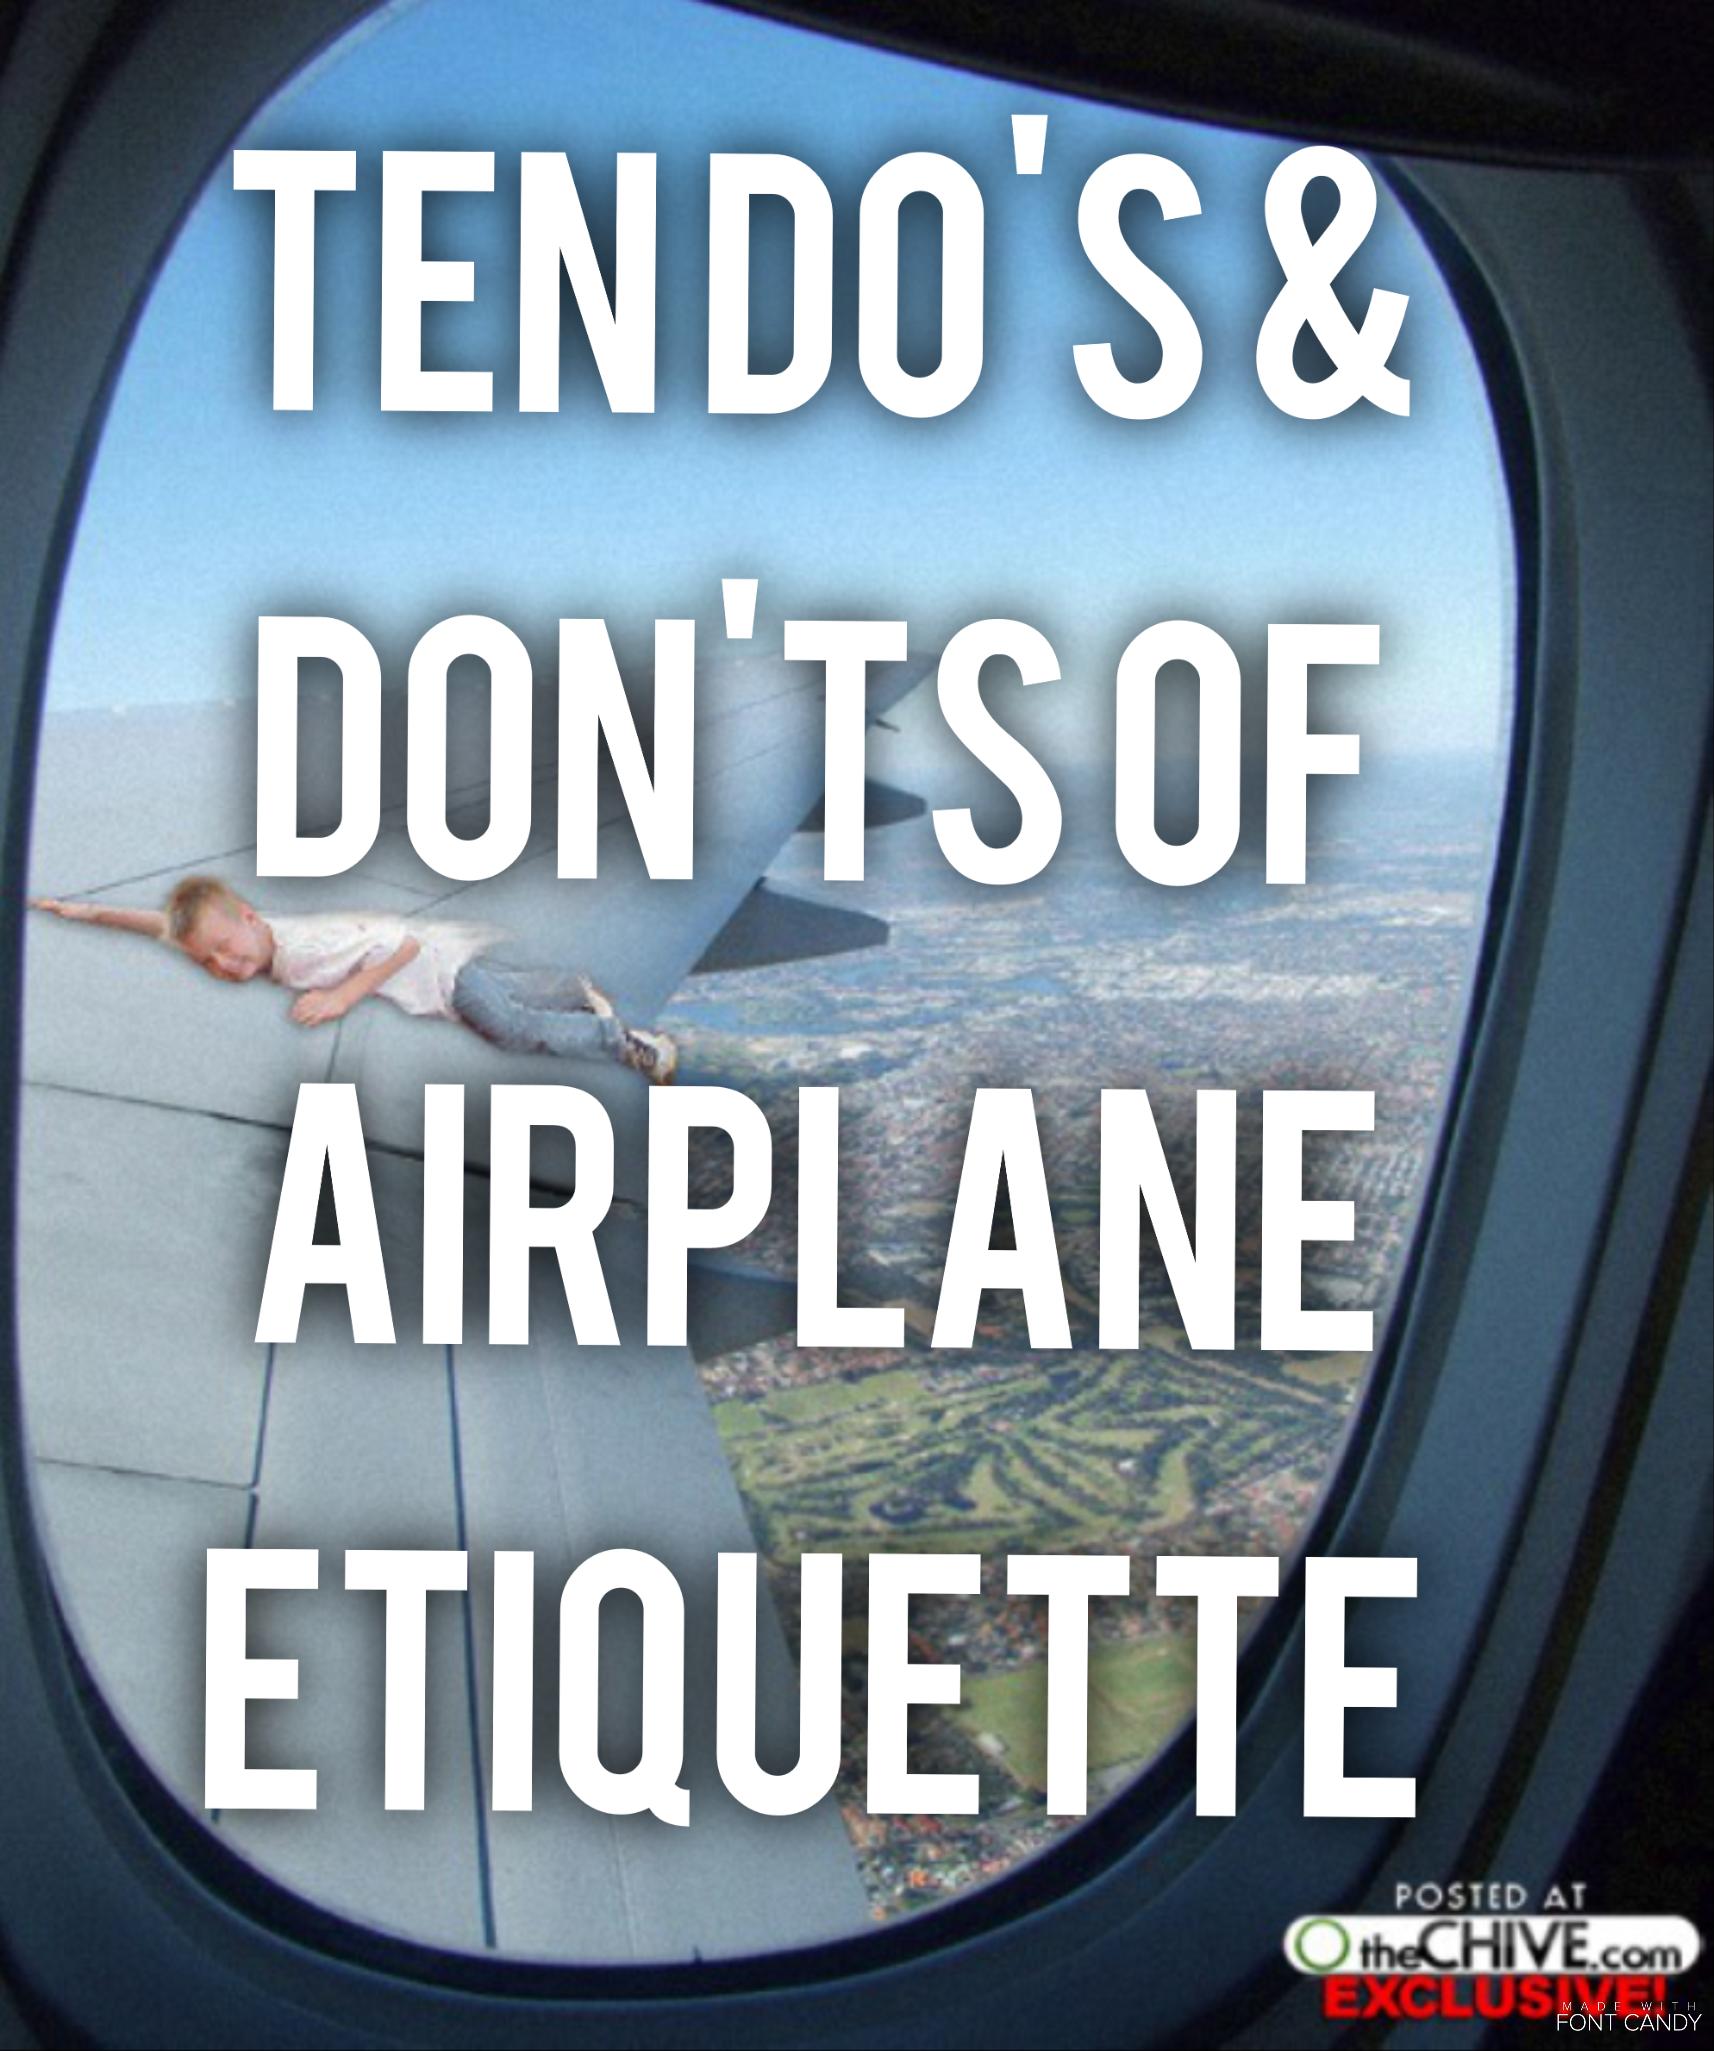 Travel: Ten Do's & Don'ts of Airplane Etiquette - HBIC Rants & Raves